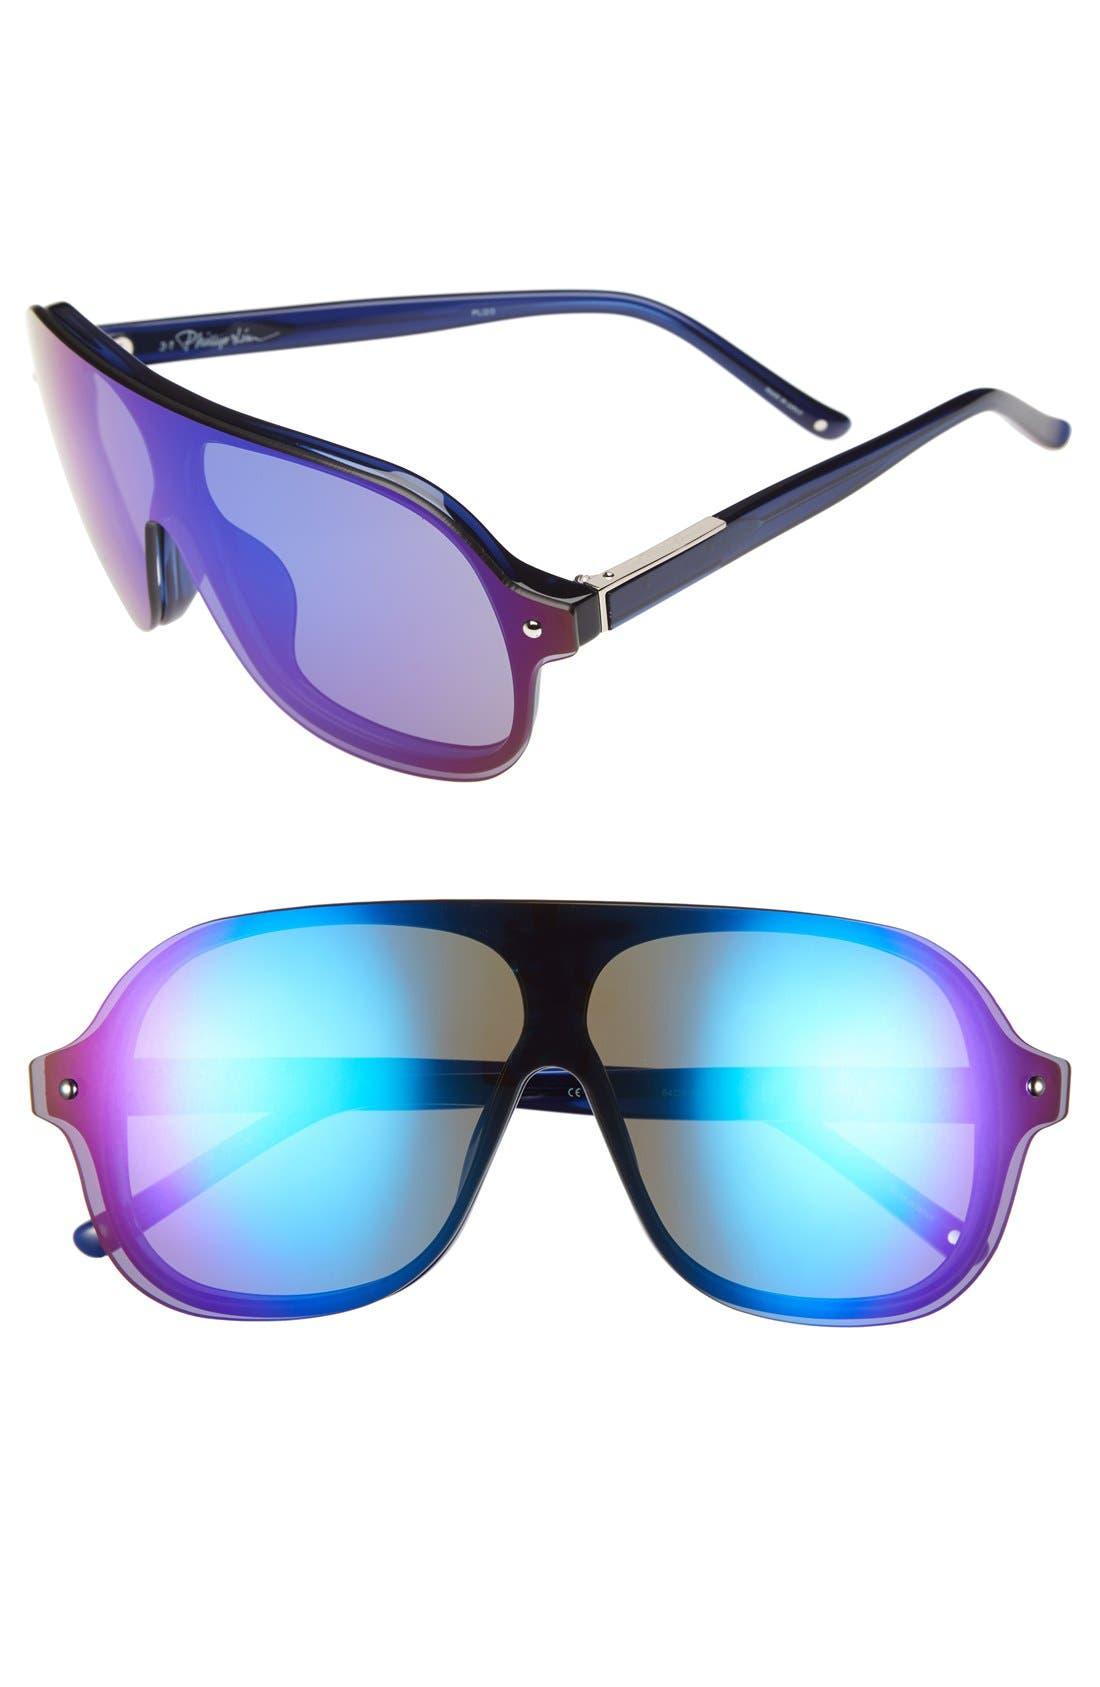 Main Image - 3.1 Phillip Lim 68mm Aviator Sunglasses